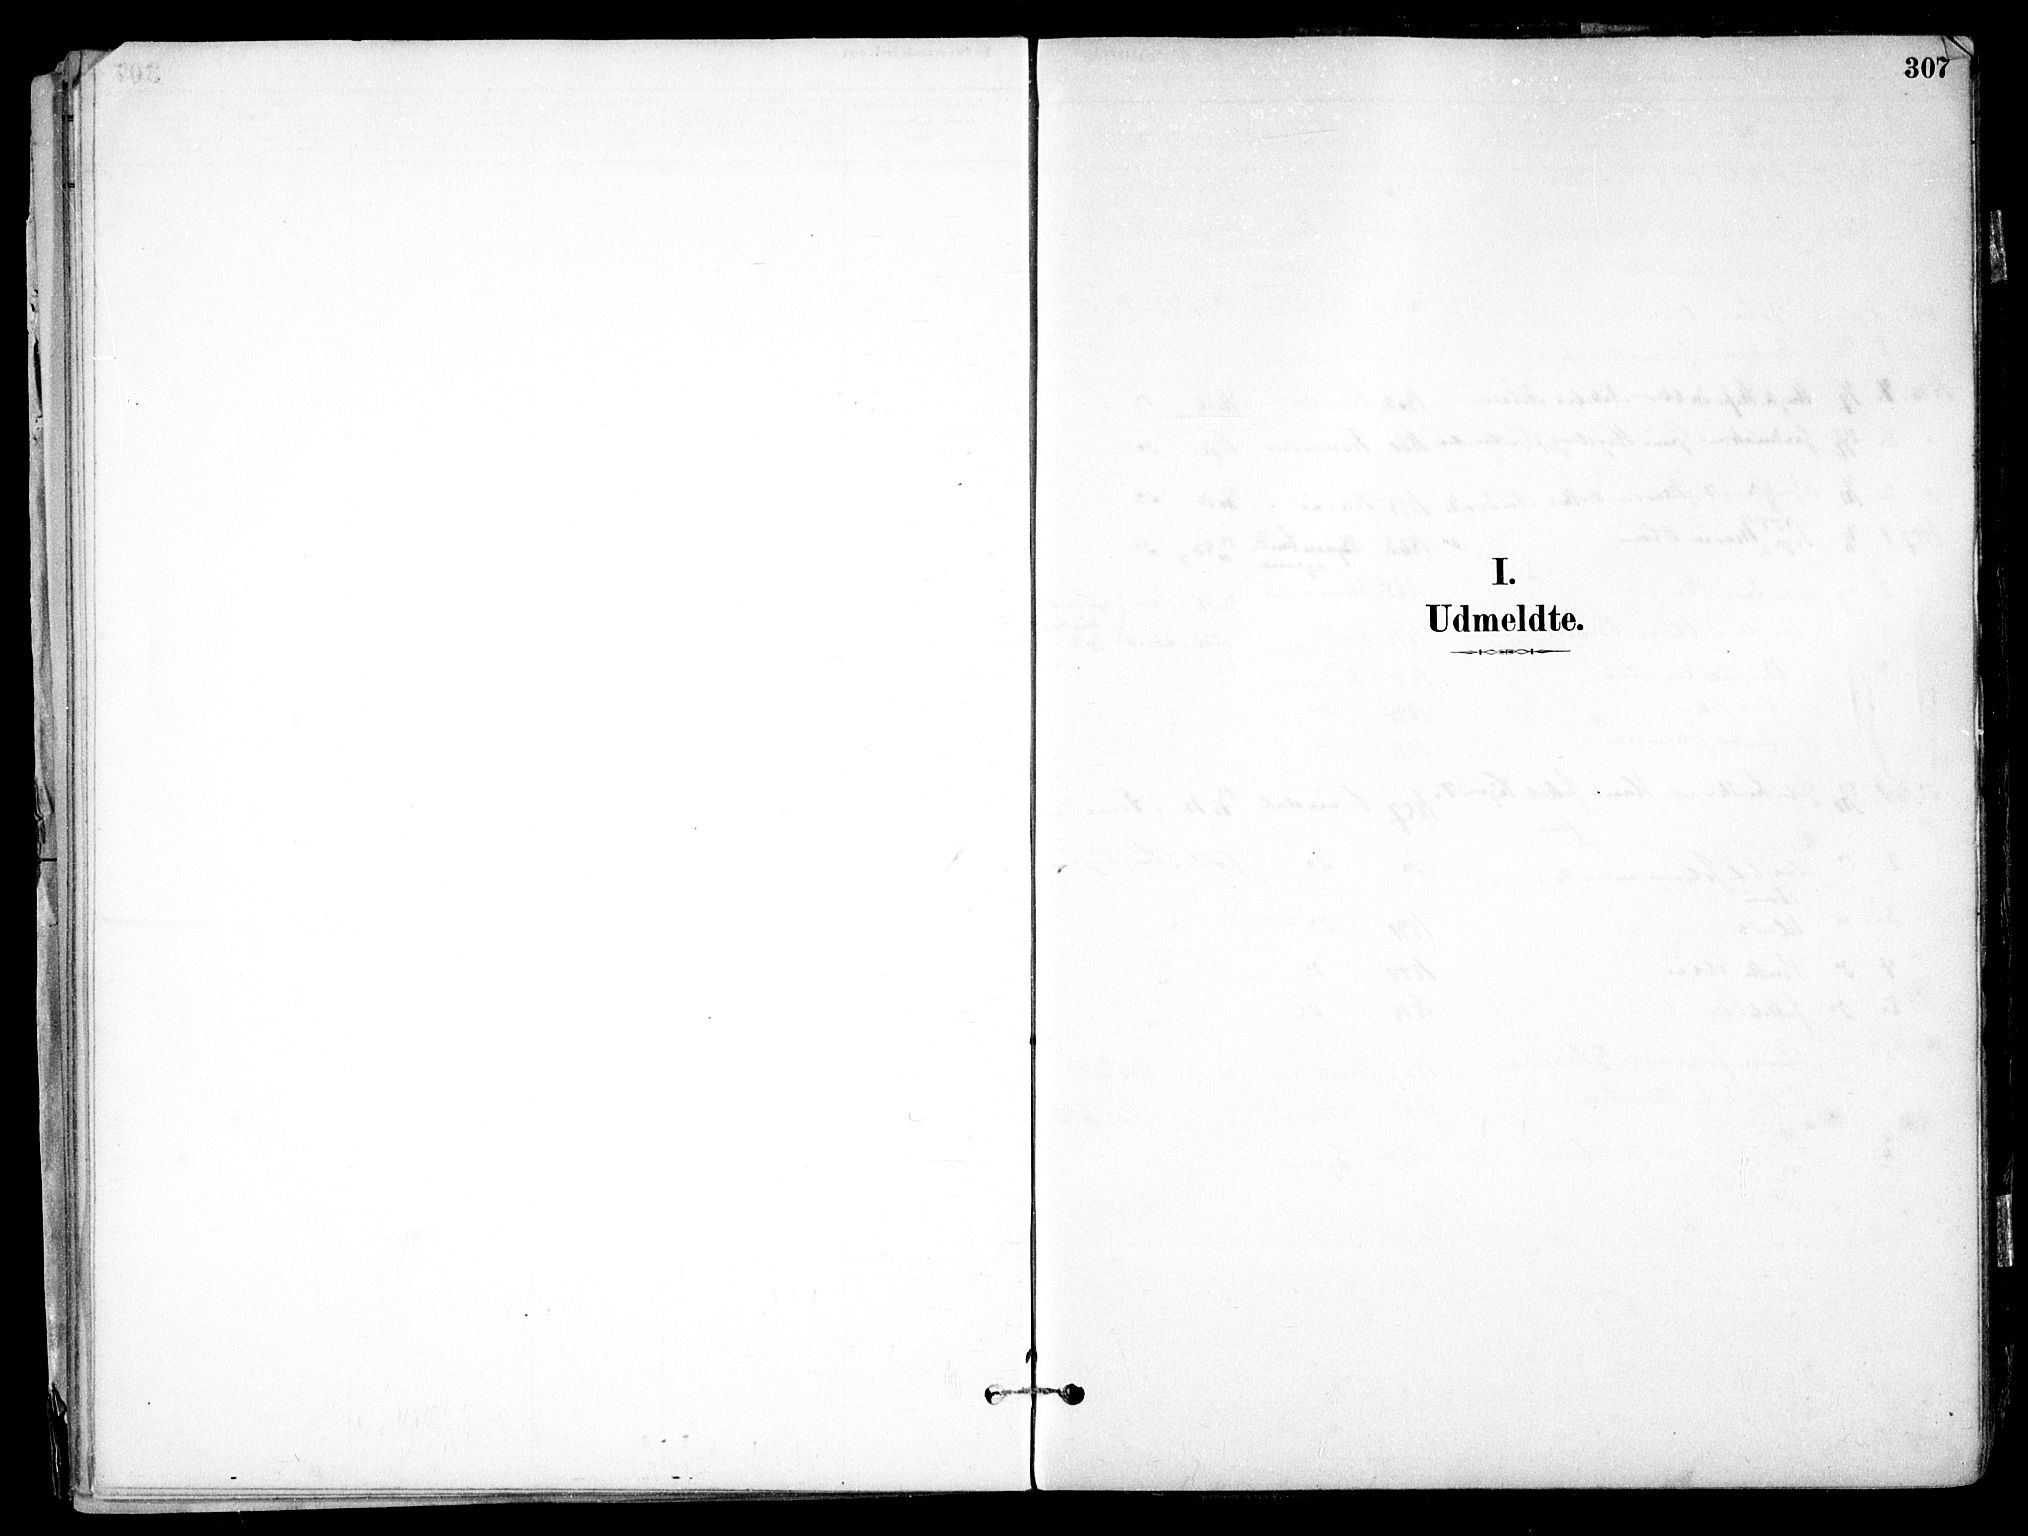 SAO, Nes prestekontor Kirkebøker, F/Fb/L0002: Ministerialbok nr. II 2, 1883-1918, s. 307